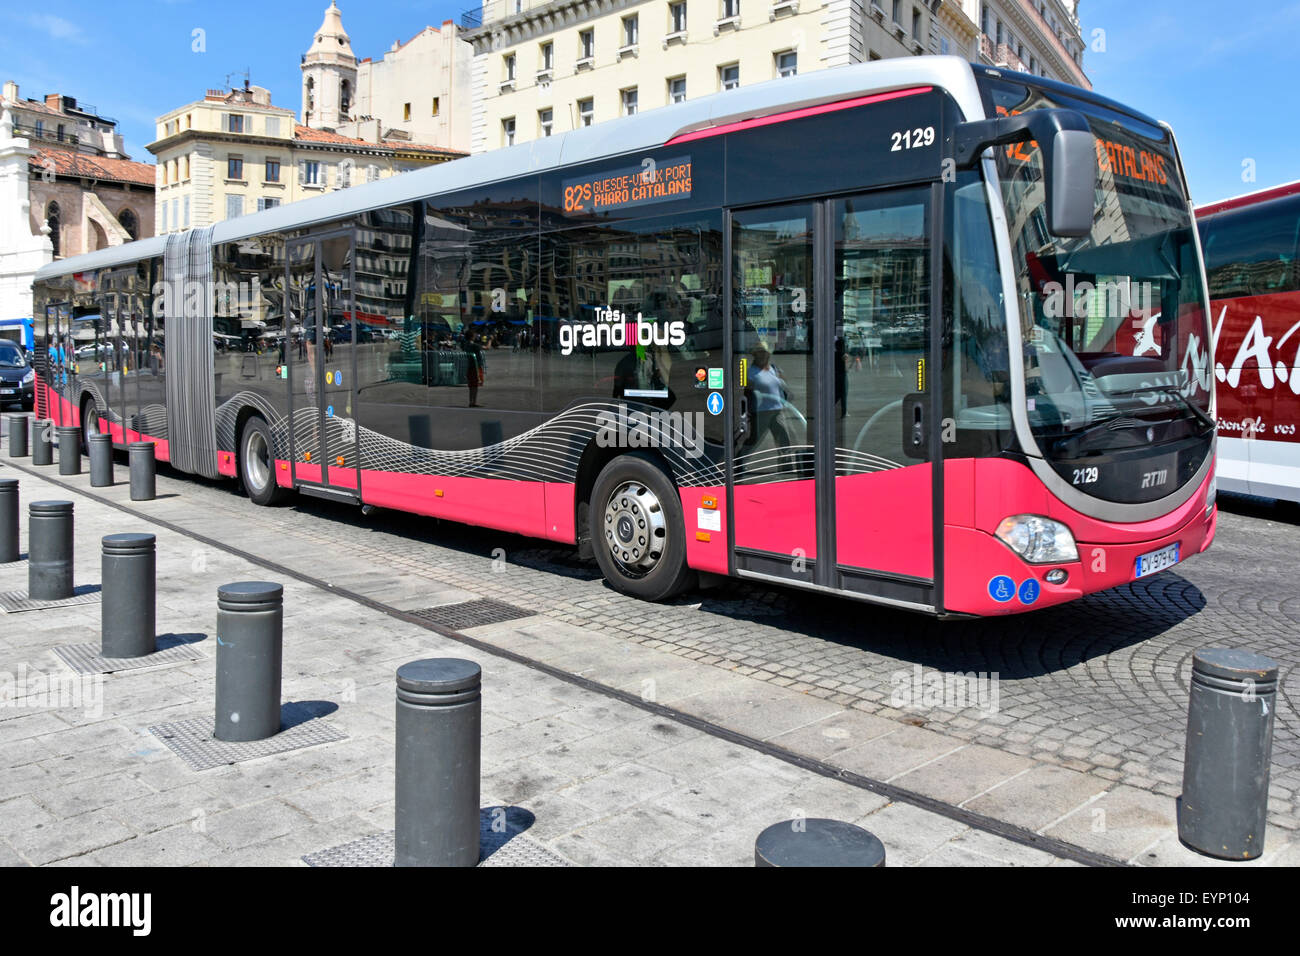 marseille rtm public transport long bendy bus at bus stop adjacent to stock photo royalty free. Black Bedroom Furniture Sets. Home Design Ideas